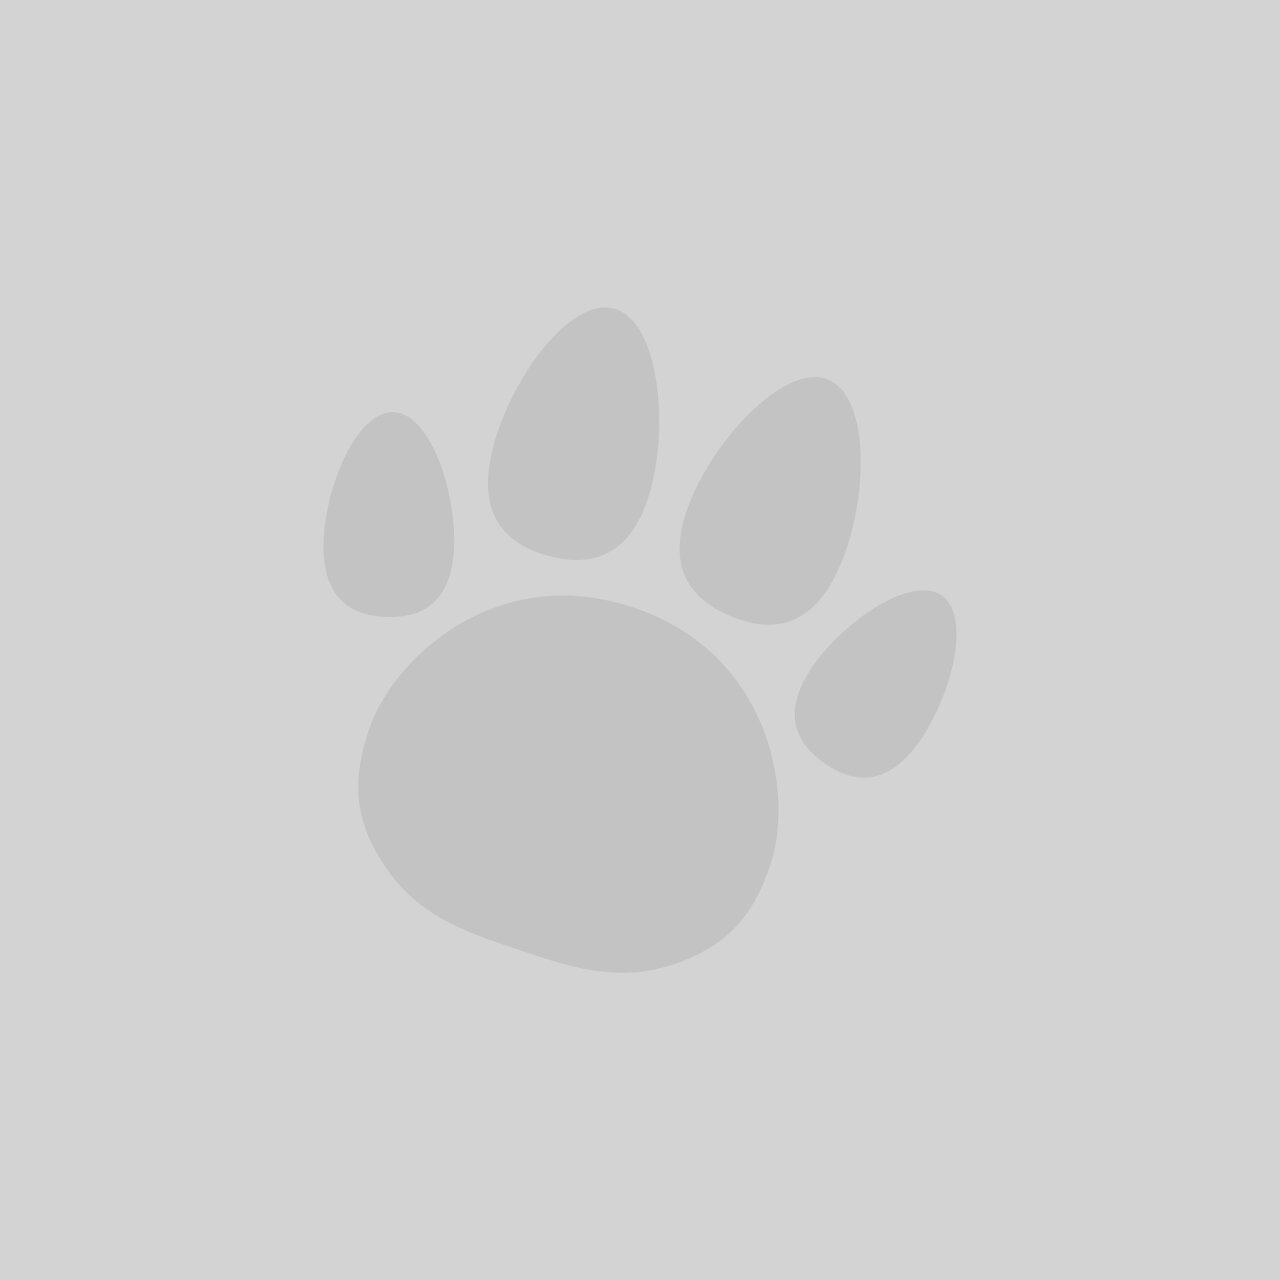 Rufus & Rosie Dog Lead Mid Grey & Light Grey Large